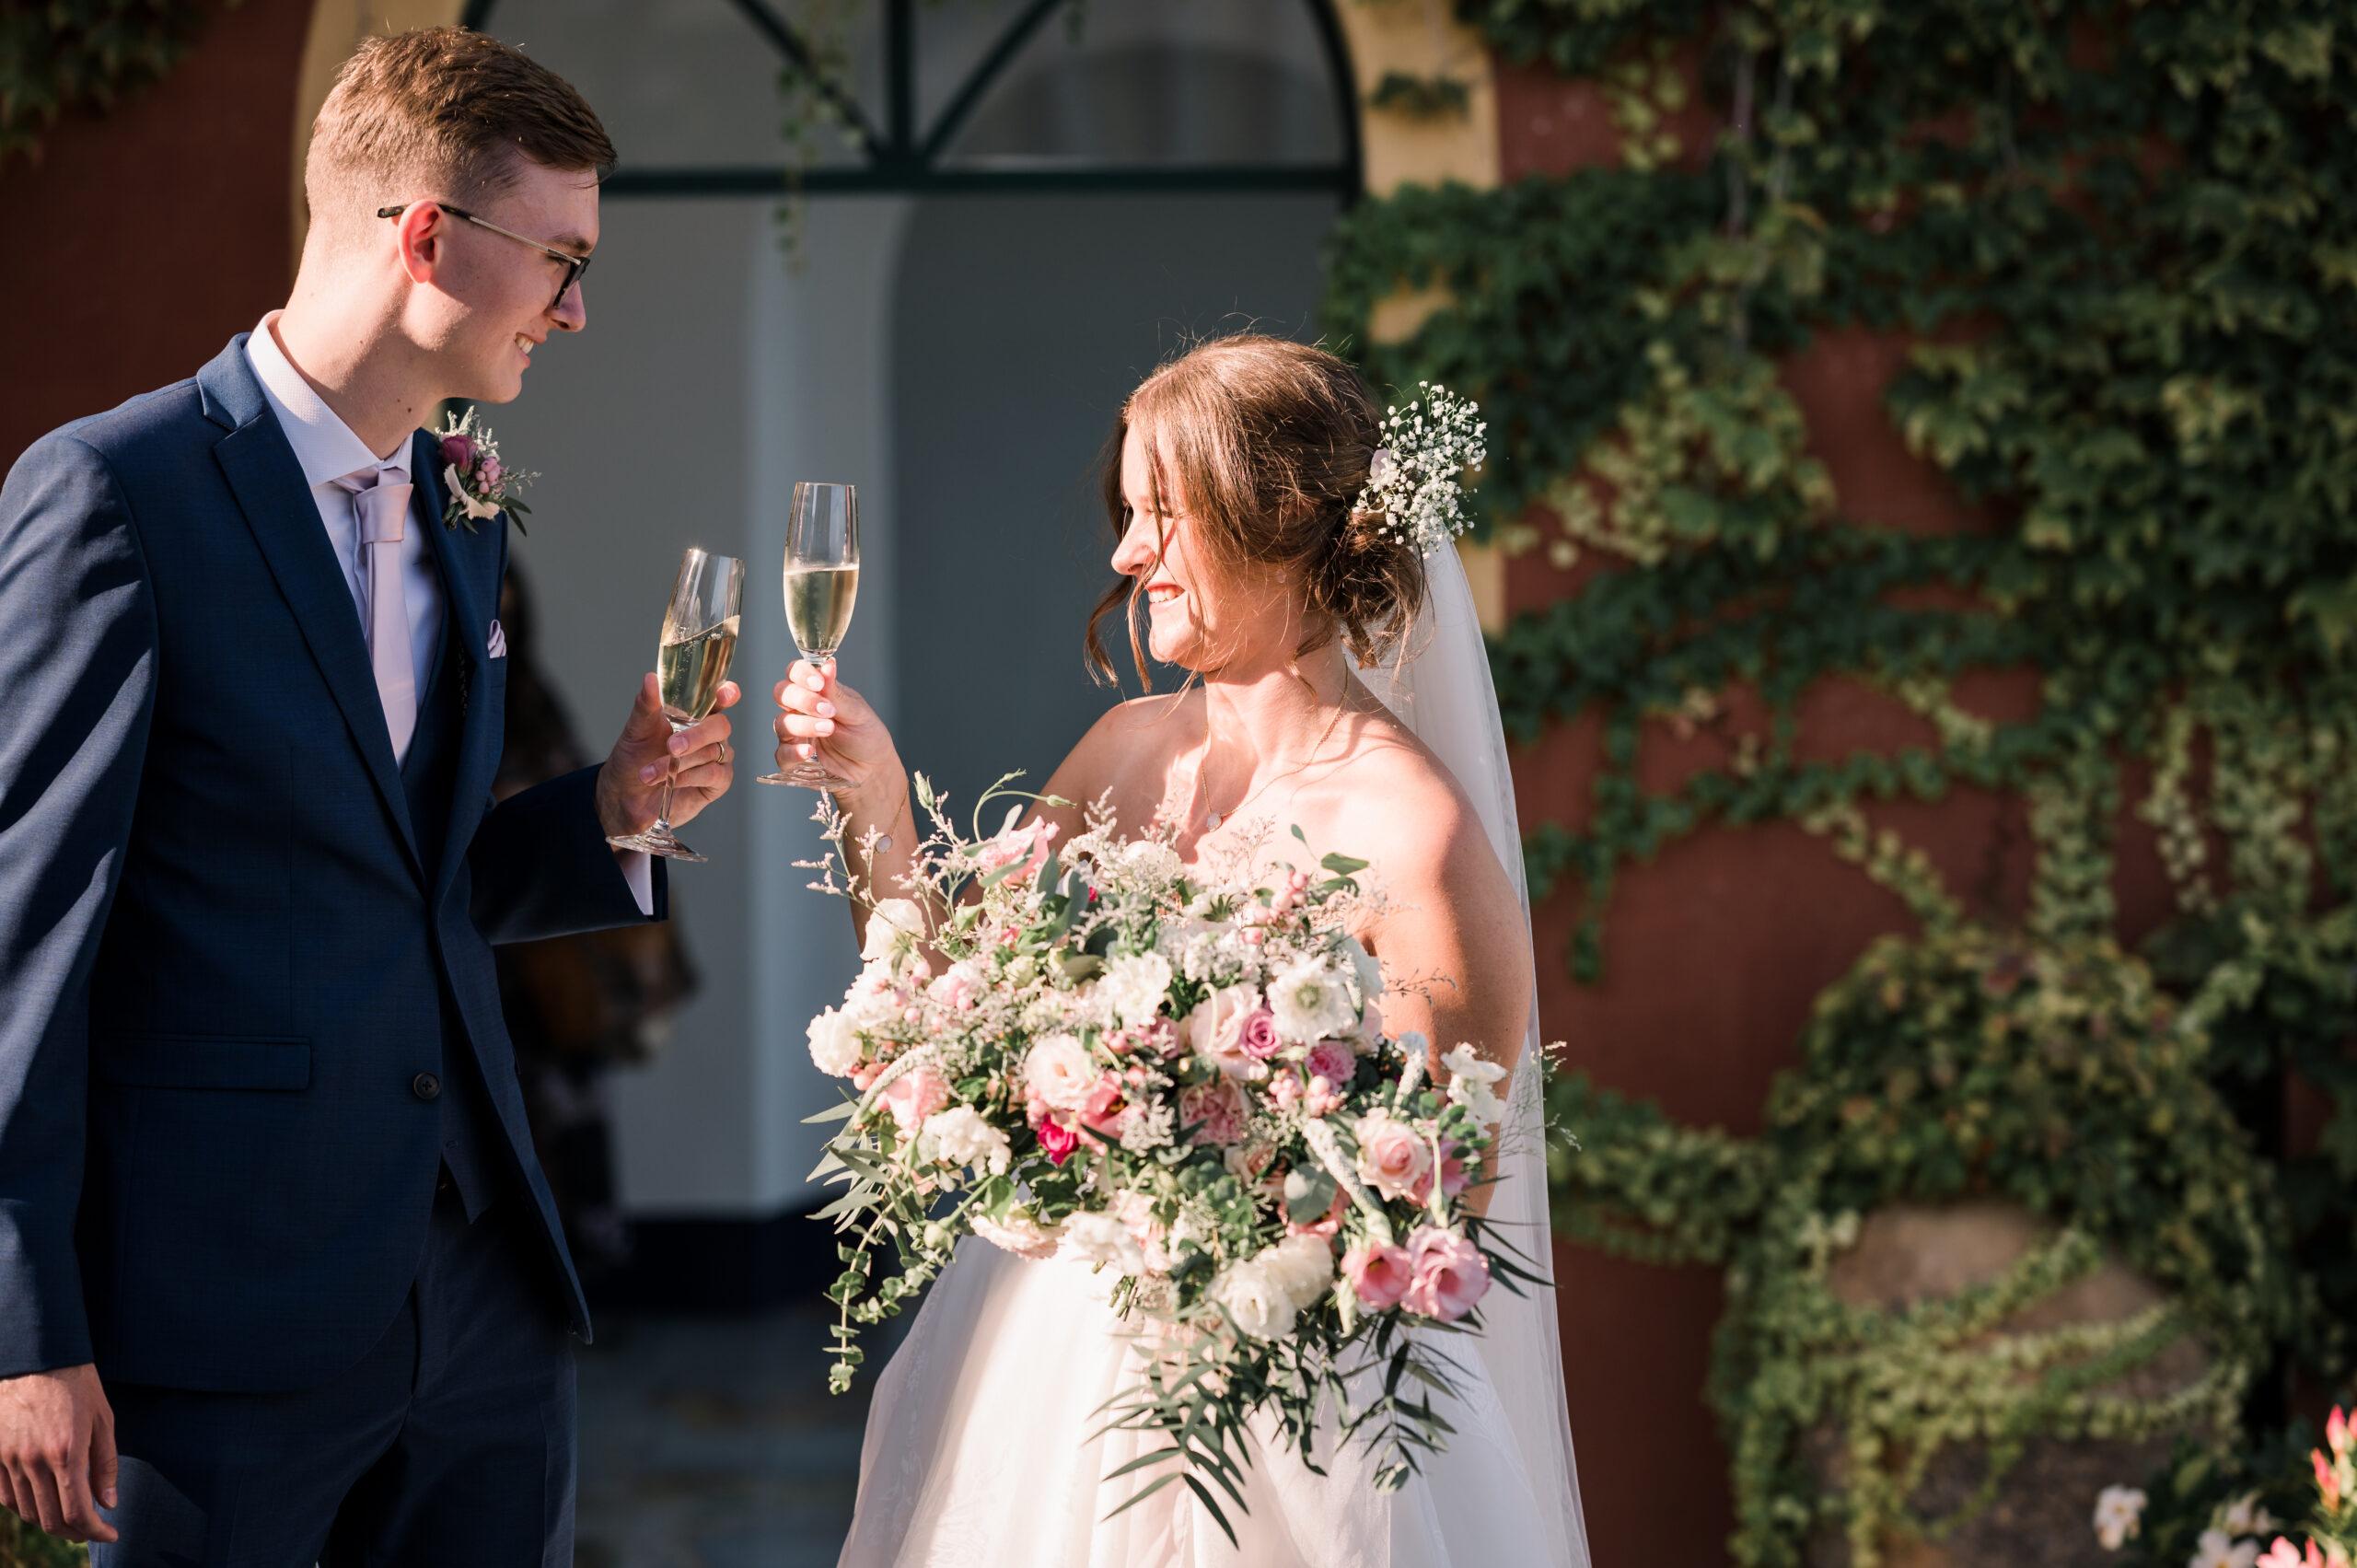 Ben and Holly wedding in Maiori, Amalfi Coast, Italy (23)